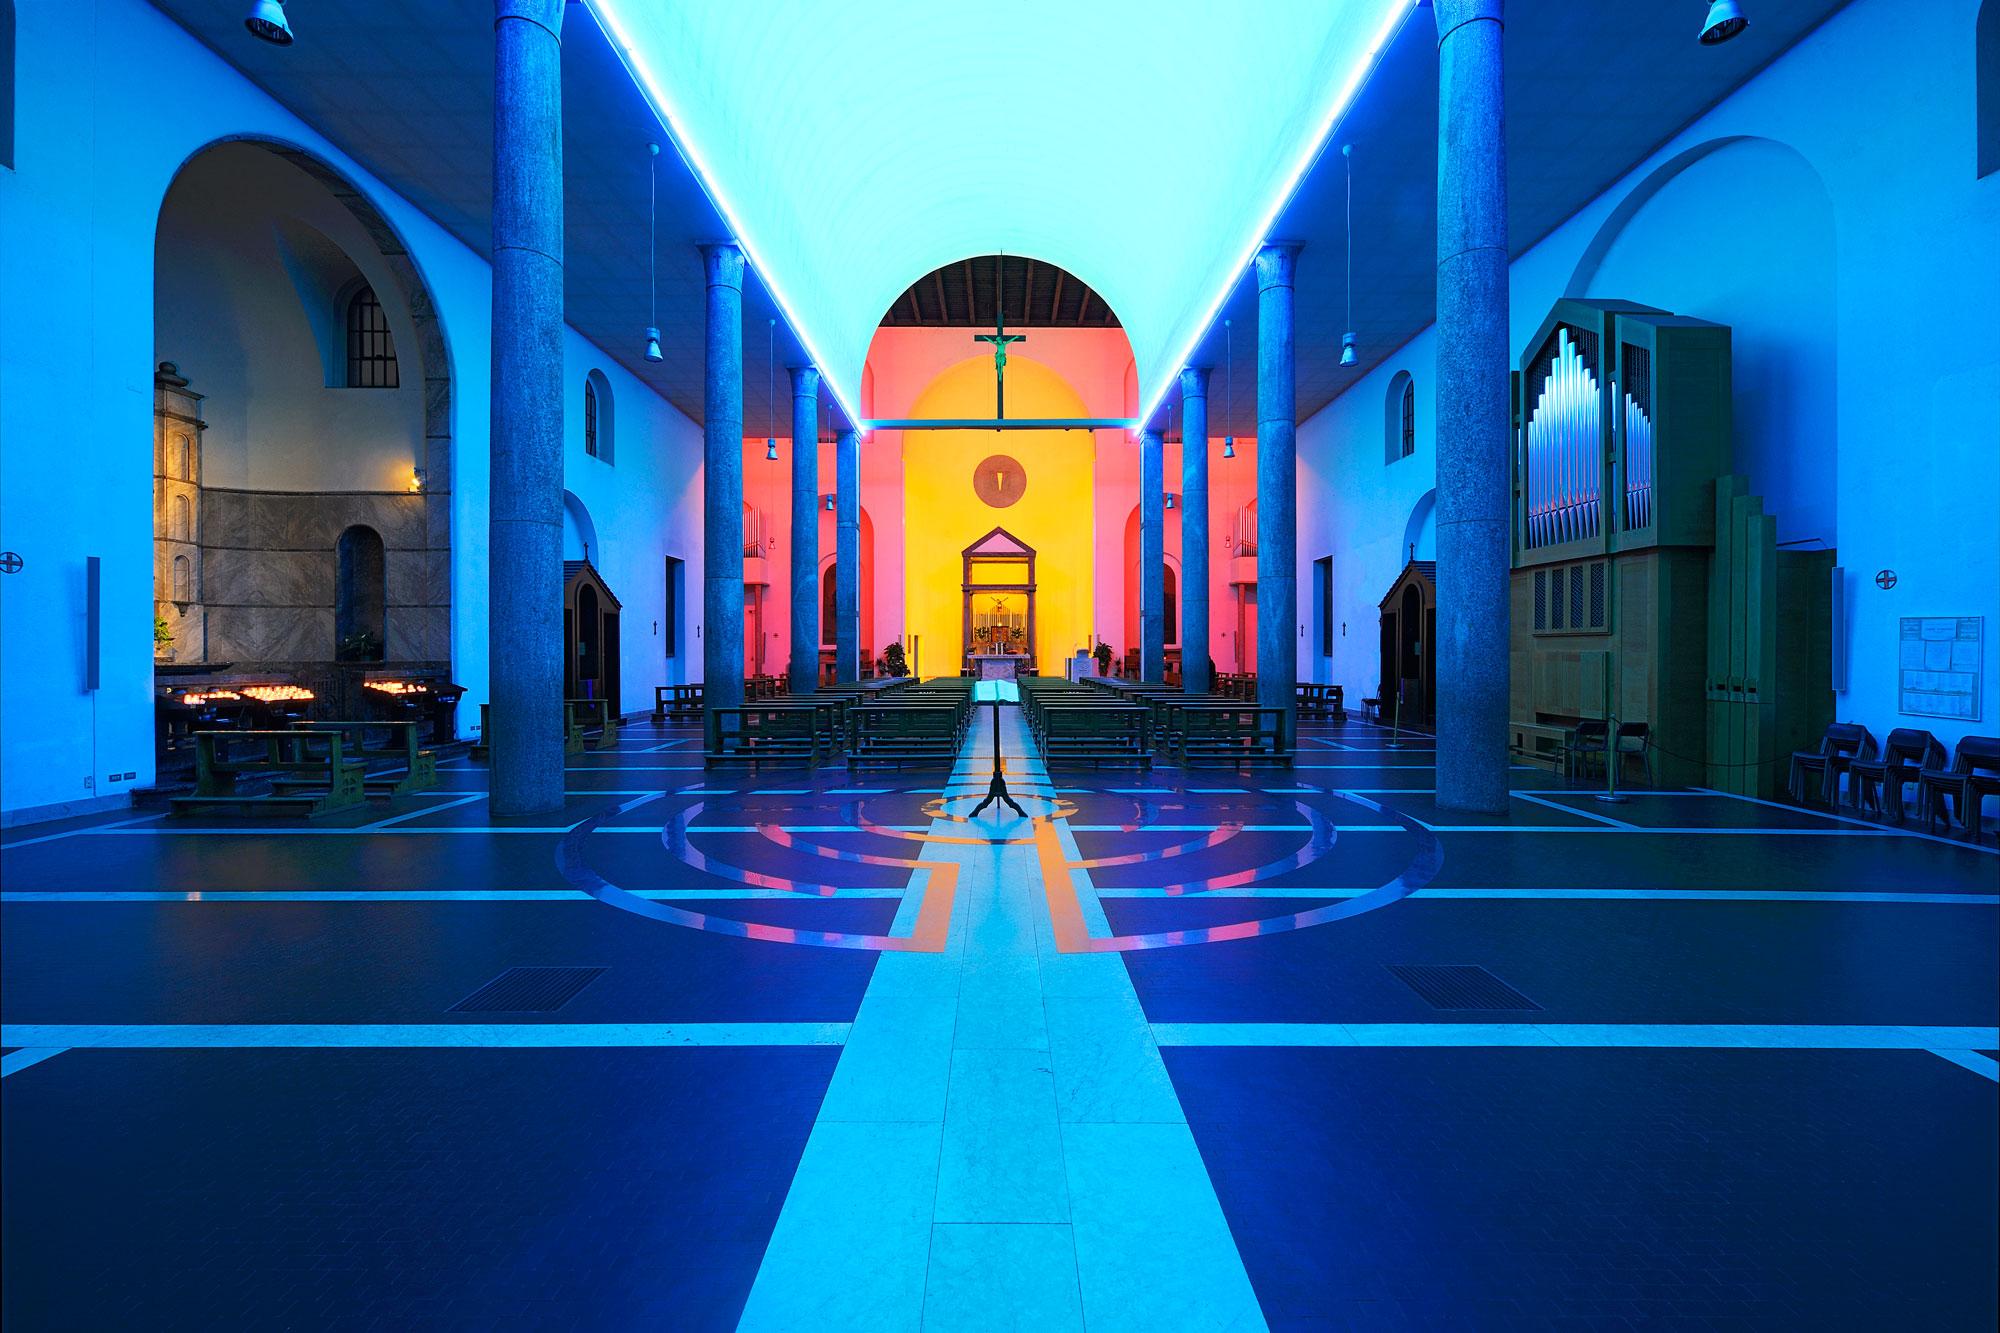 Dan Flavin, Untitled (Chiesa Rossa a Milano, dal 1996)